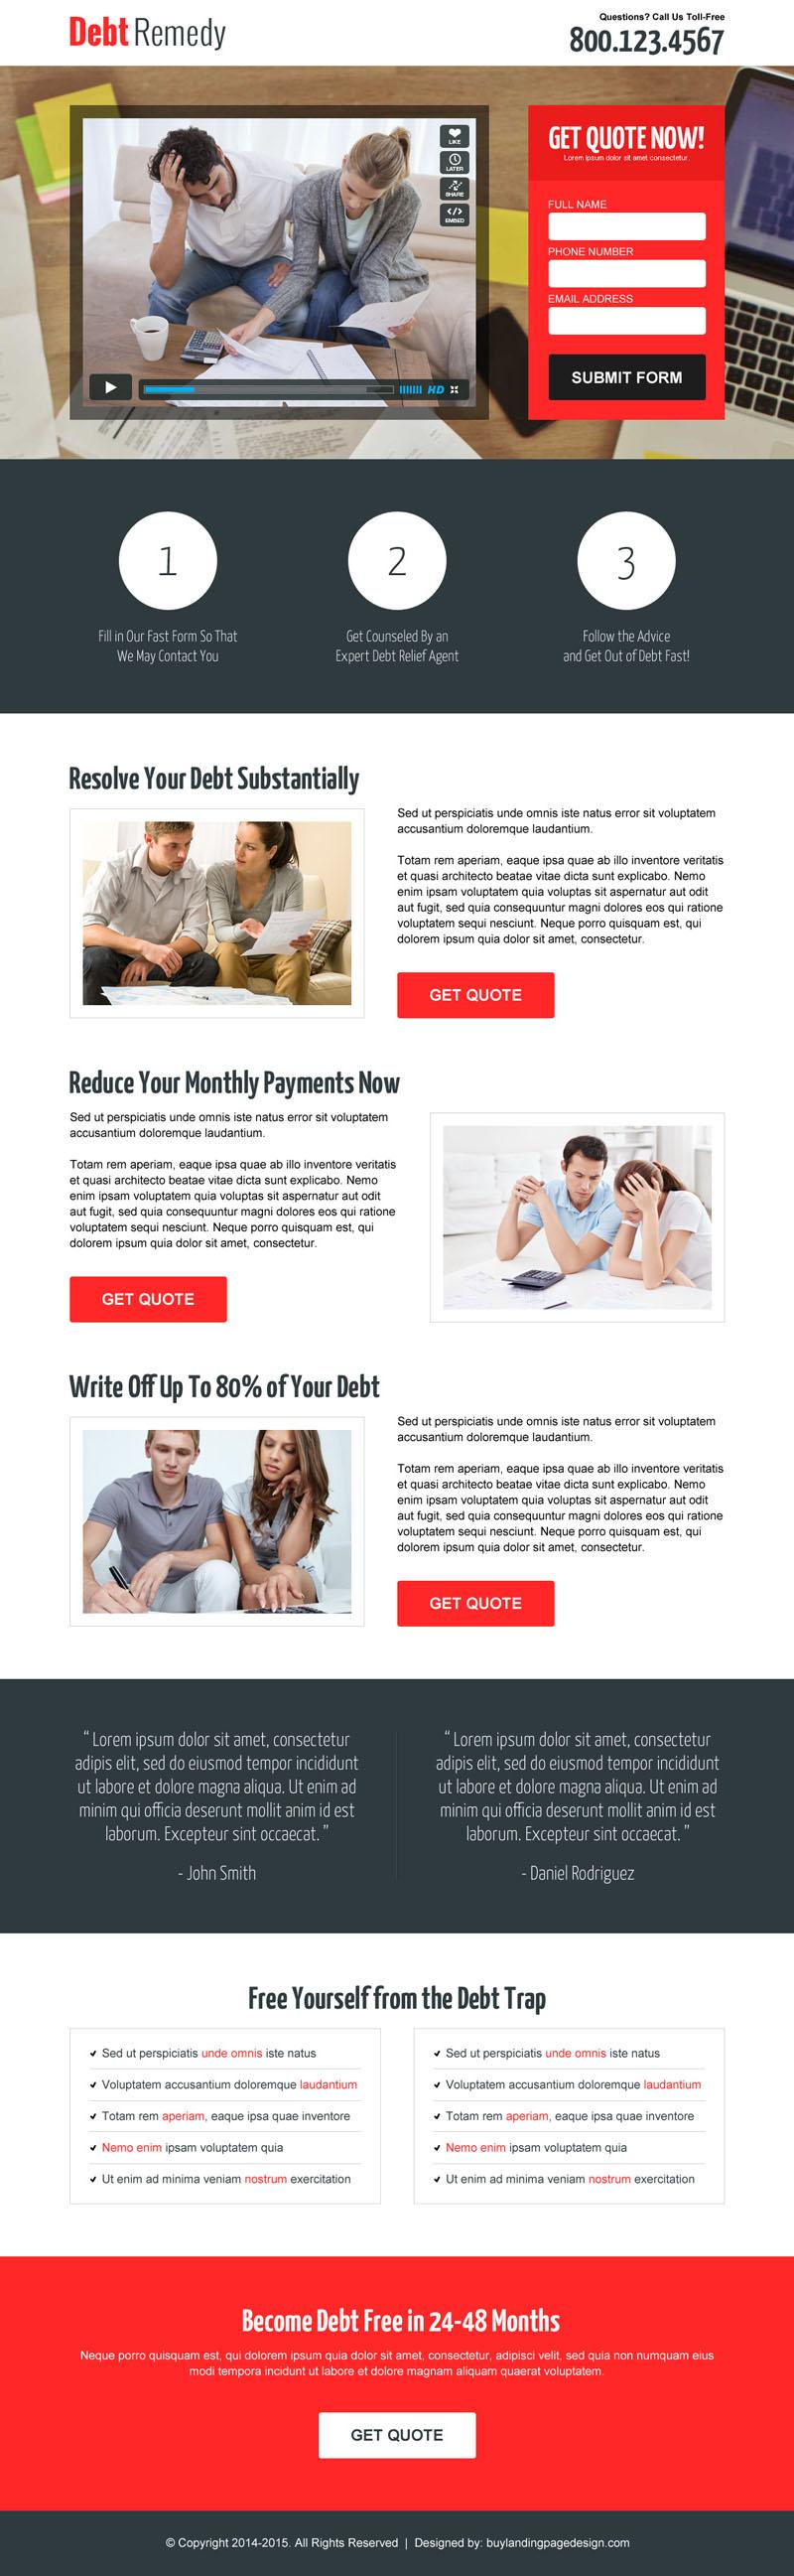 debt-lead-capture-video-landing-page-design-template-to-capture-maximum-leads-for-debt-relief-business-040